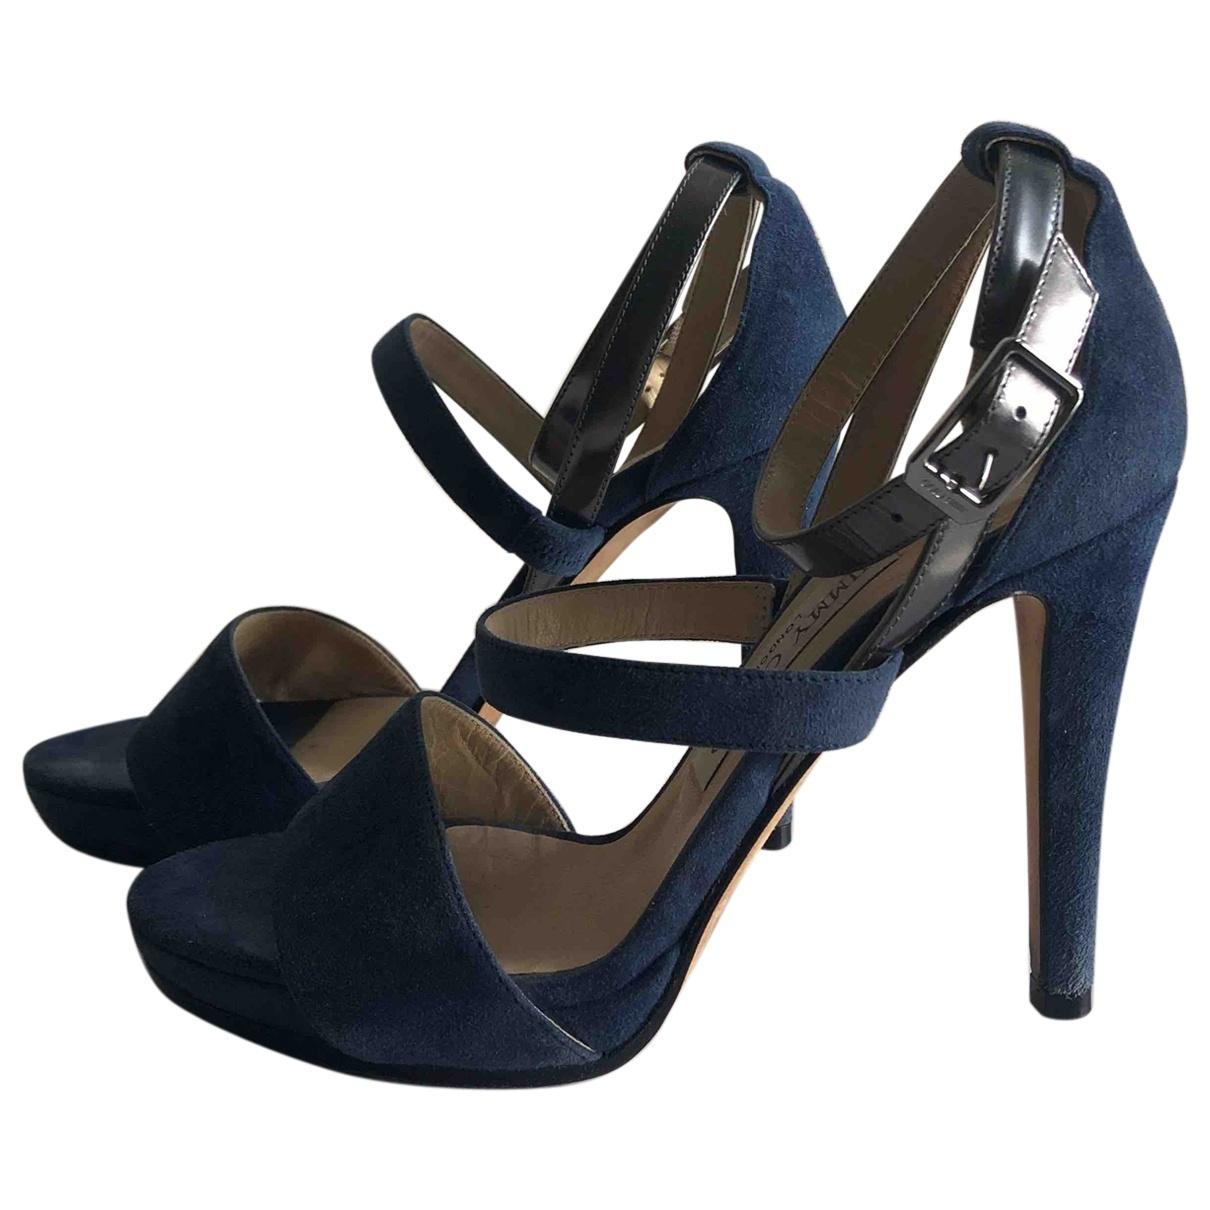 Jimmy Choo \N Blue Suede Sandals for Women 36 EU